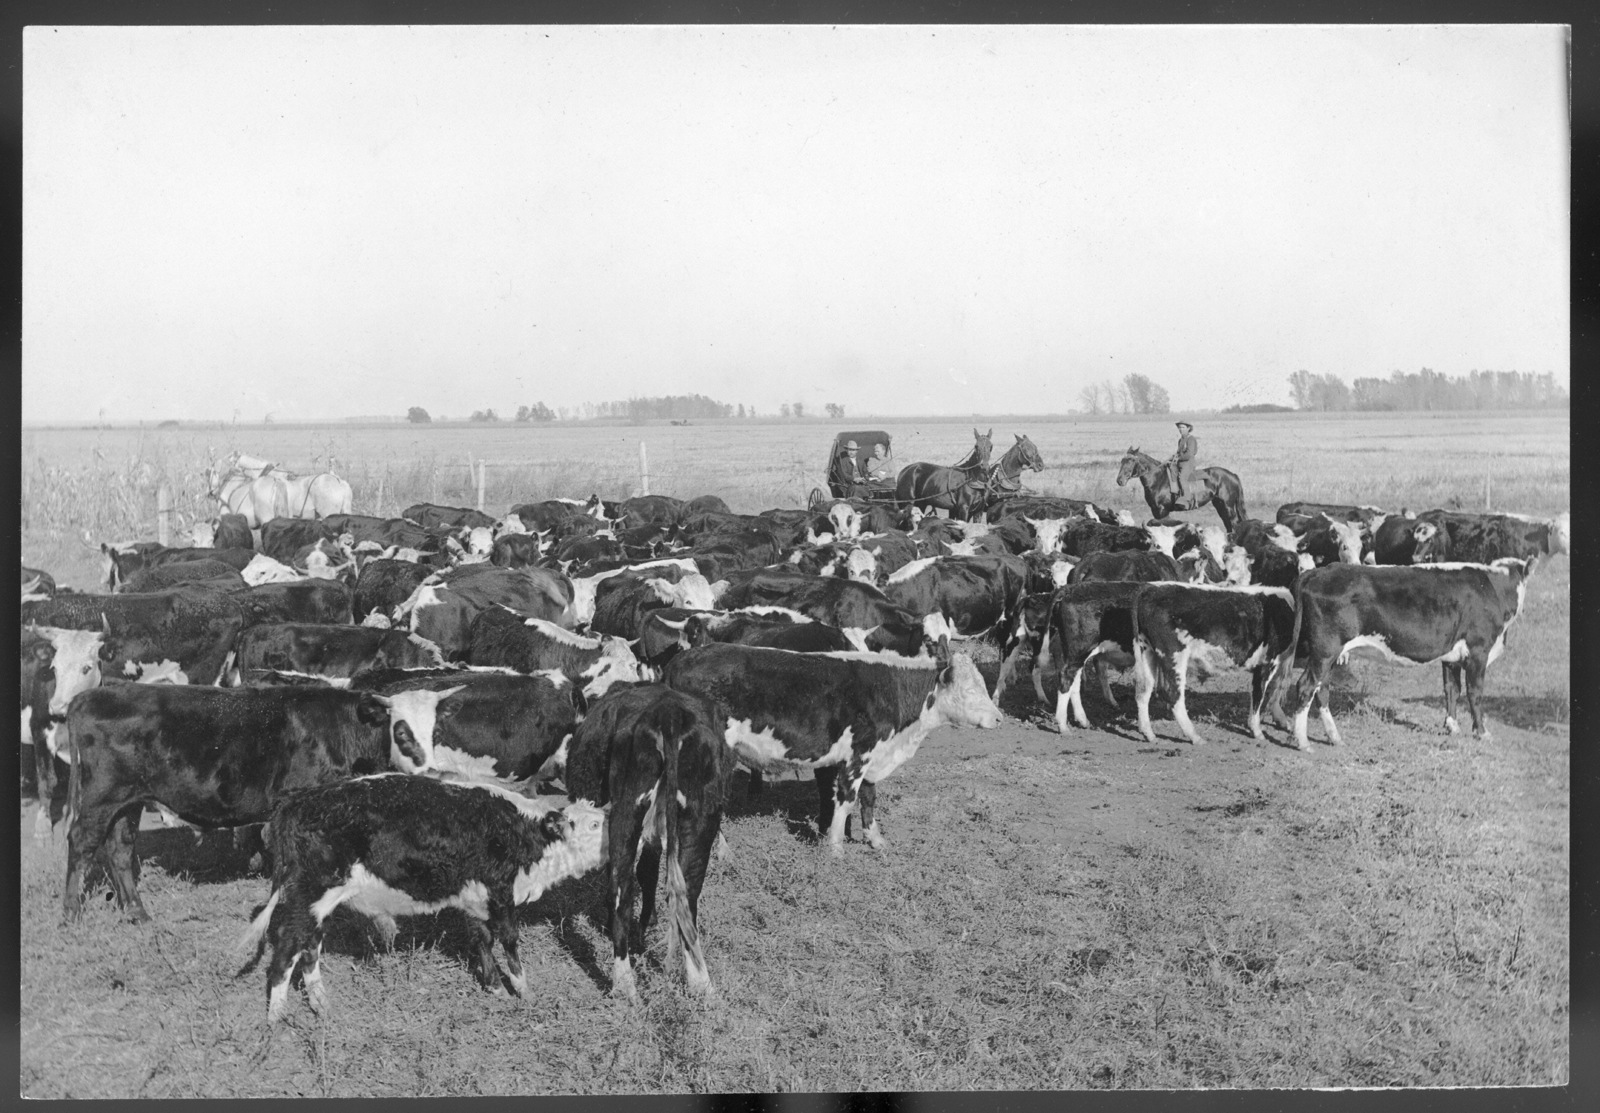 Cattle on the Lou Hammer ranch near Wood River, Hall County, Nebraska